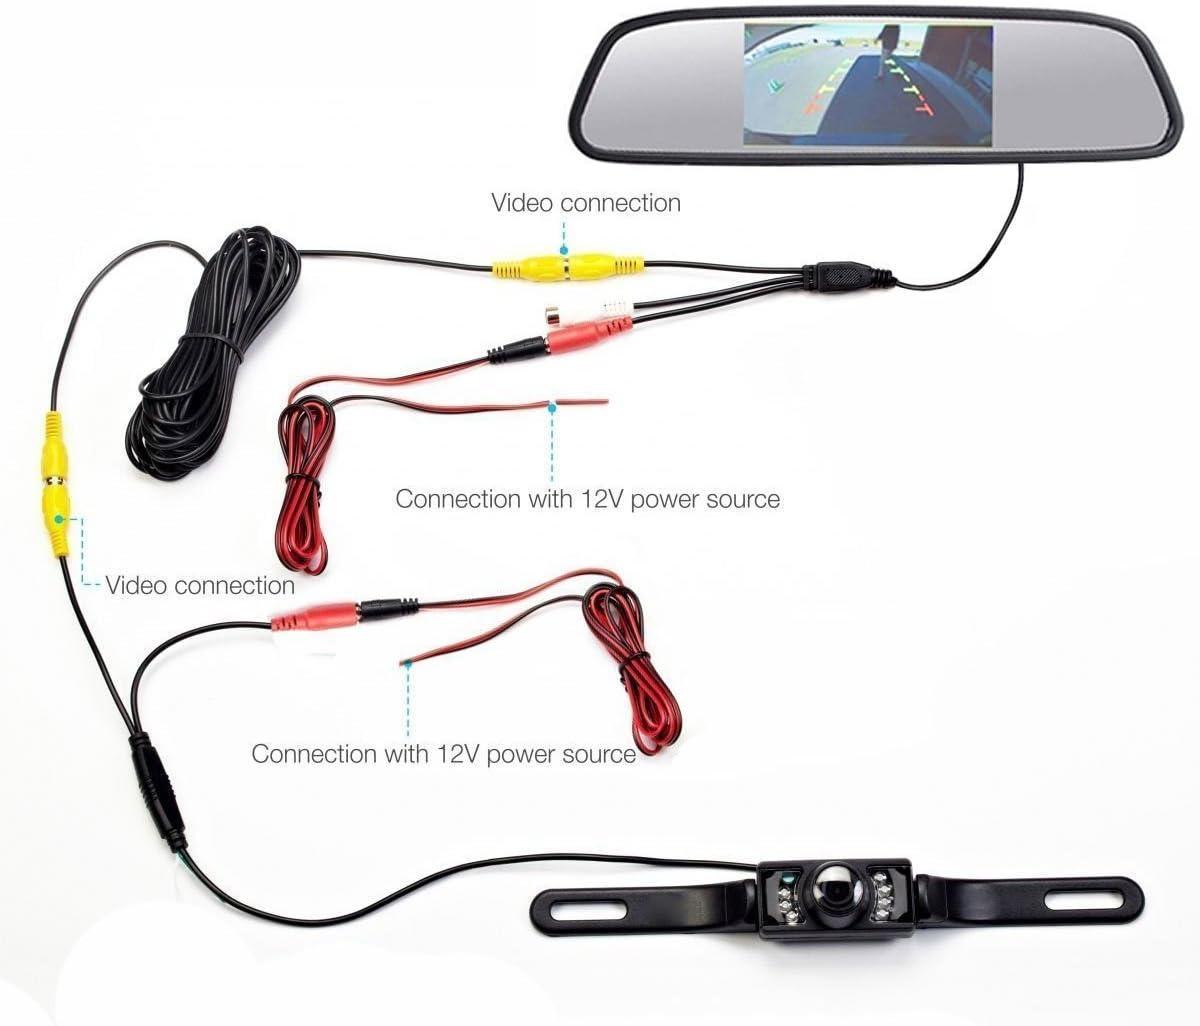 Waterproof Backup Camera and Monitor kit, 4.3inch Car Tft-LCD Mirror Monitor 7 LED Night Vision Rear View Camera Parking Reverse System Assembly 4.3 inch Mirror